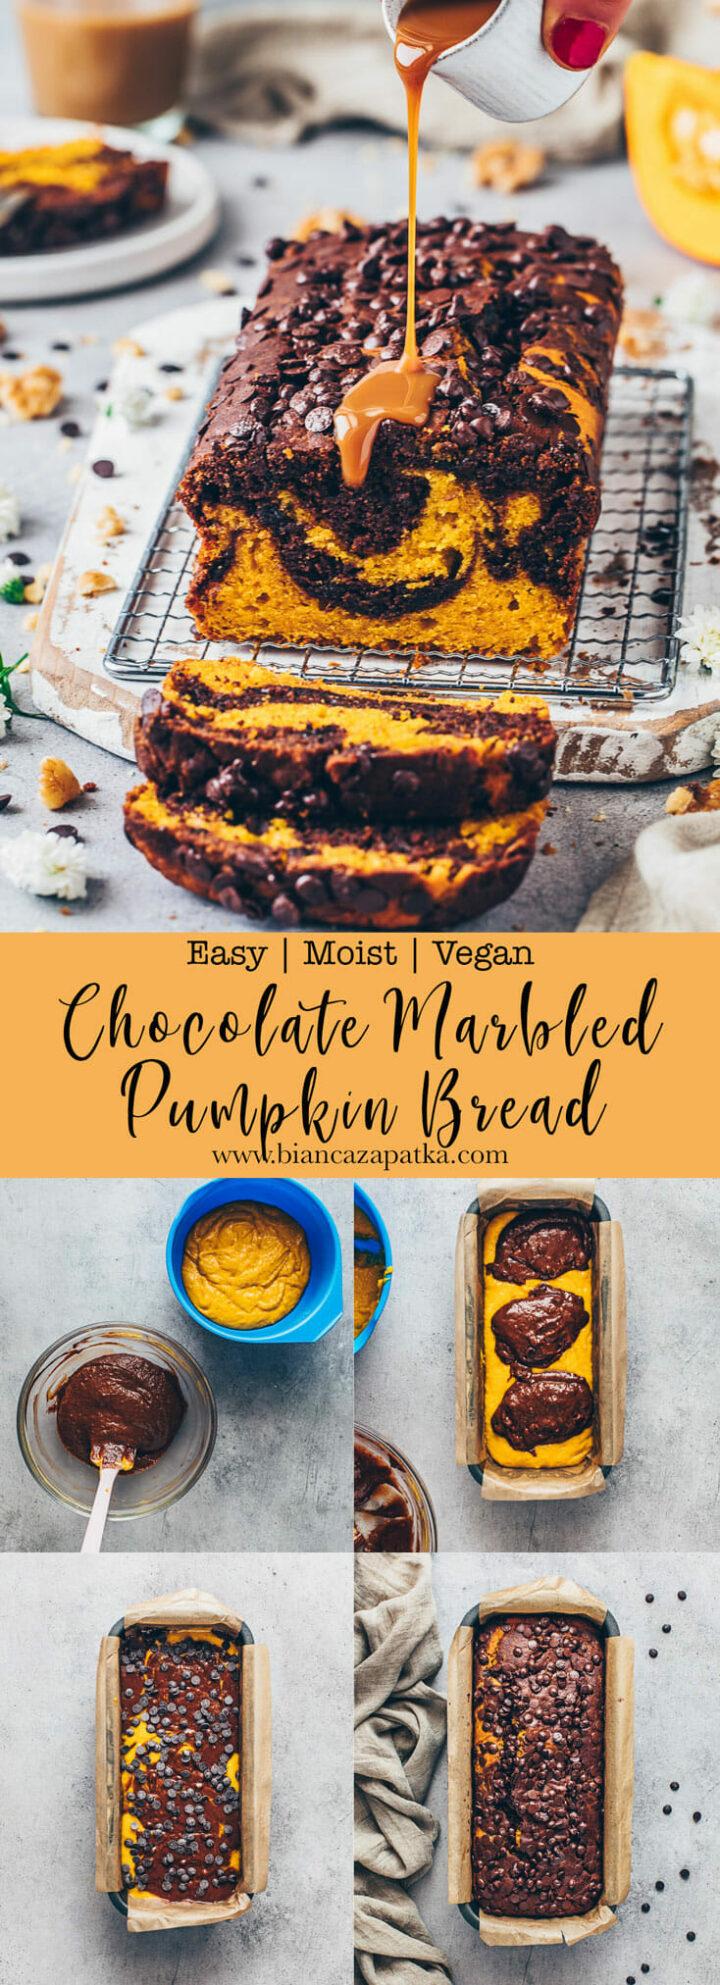 Chocolate Chip Pumpkin Bread (Vegan Marble Cake Loaf)